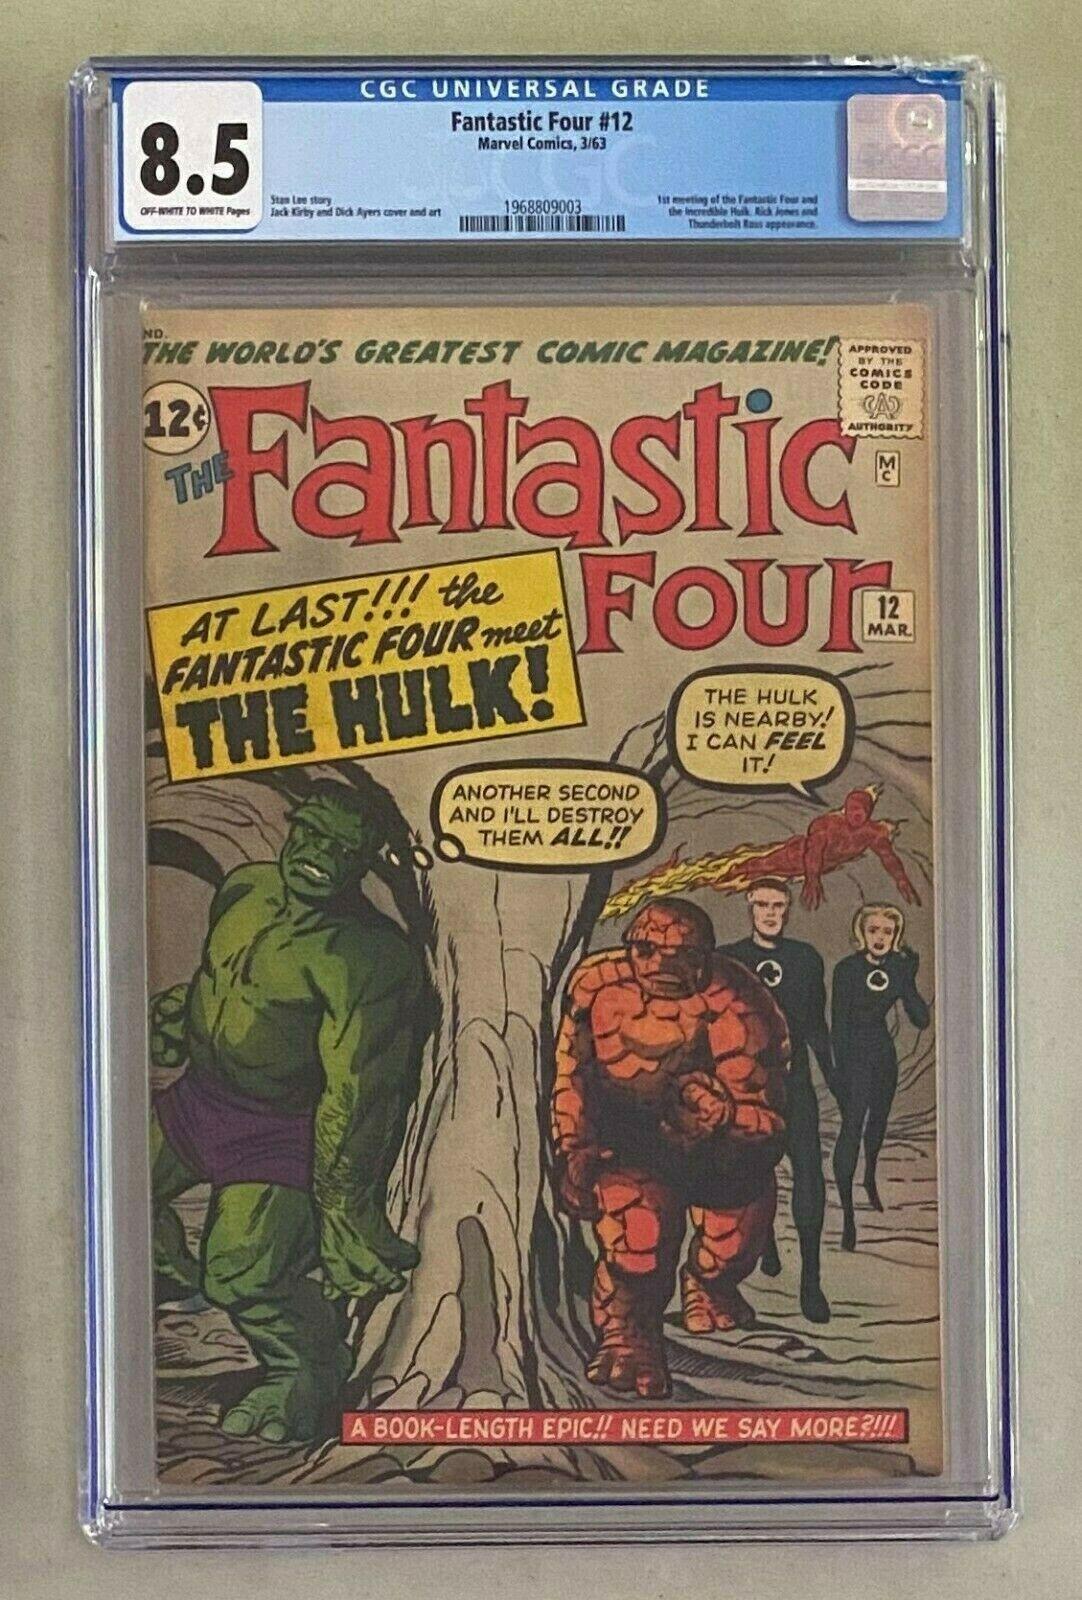 FANTASTIC 4 FOUR 12 Marvel Comics 1963 CGC 85 First Meeting Incredible Hulk